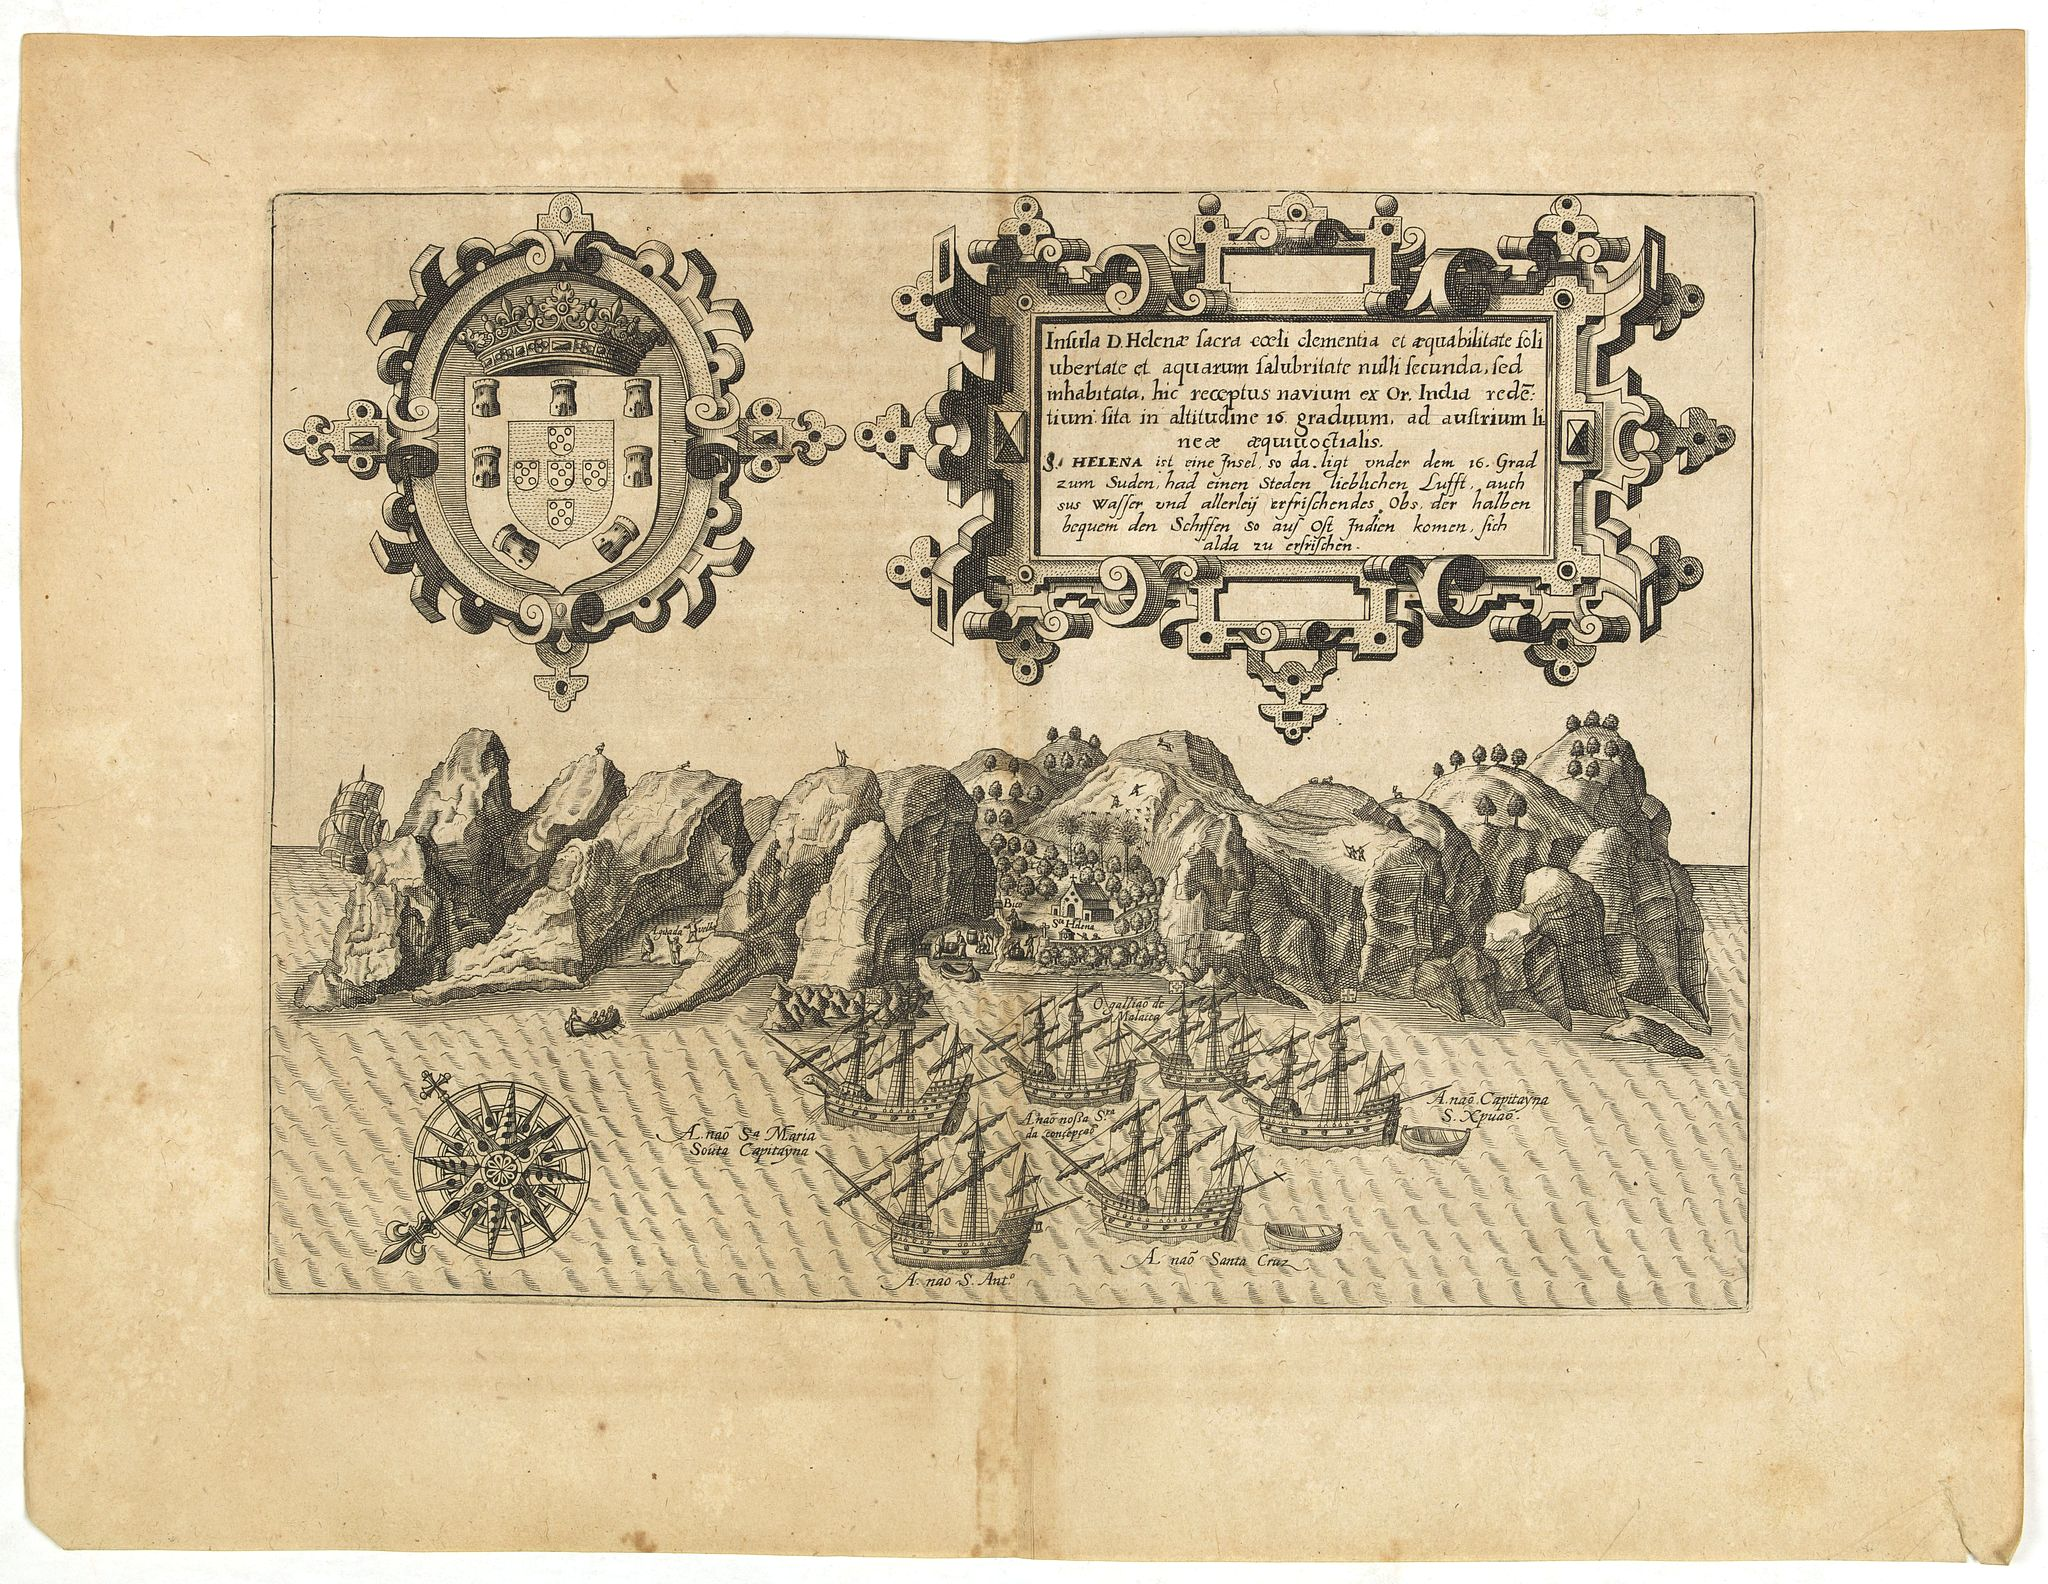 DE BRY, Th. -  Insula D.Helenae sacra coeli Clementia . . .